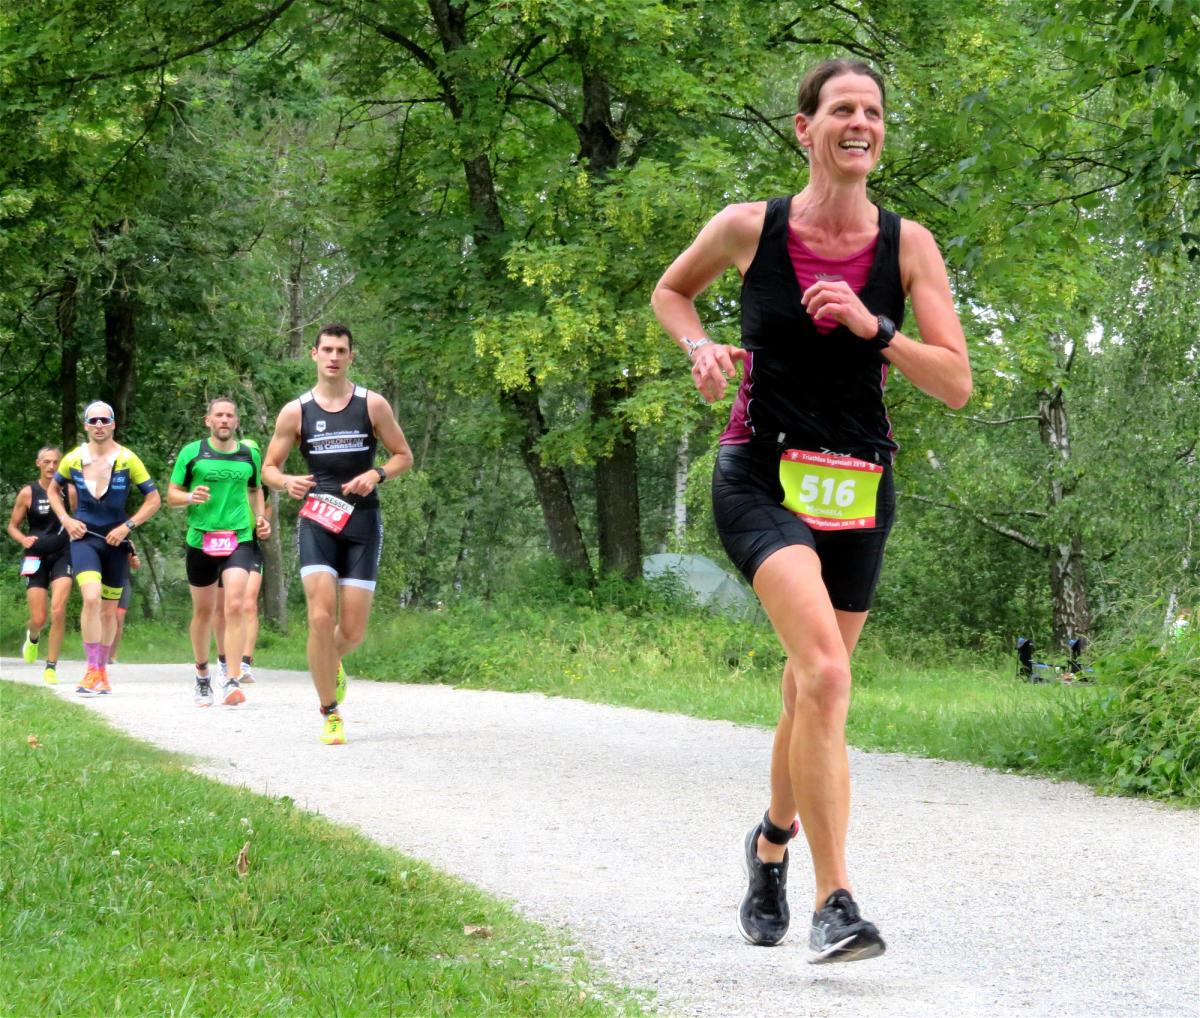 Ingolstadt Triathlon